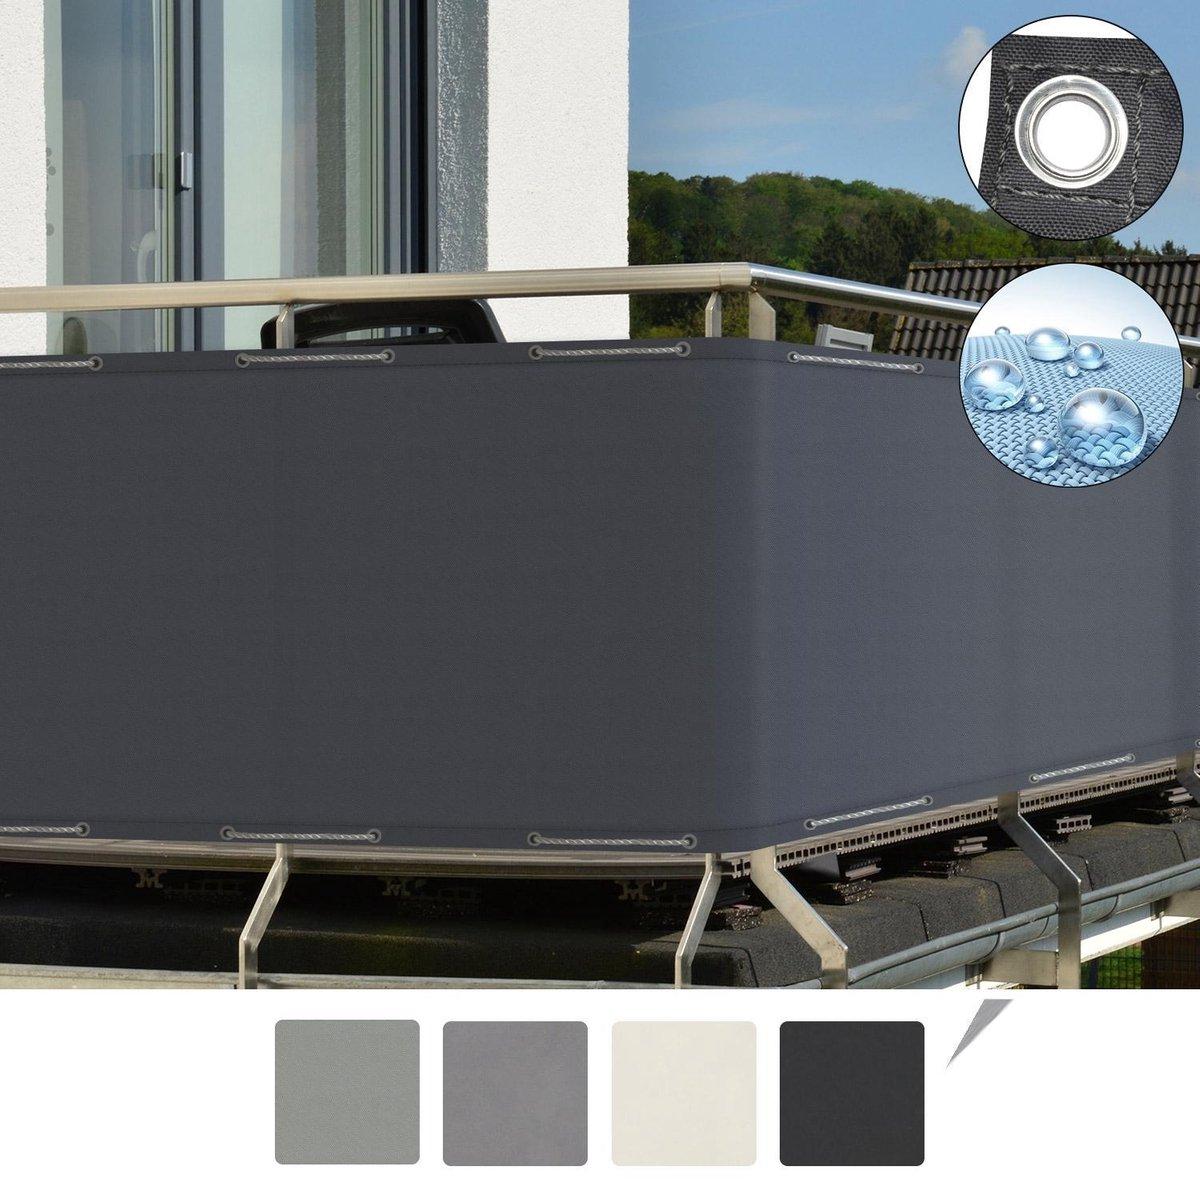 Sol Royal balkonscherm   antraciet 90x500cm - balkondoek waterafstotend - Solvision PB2